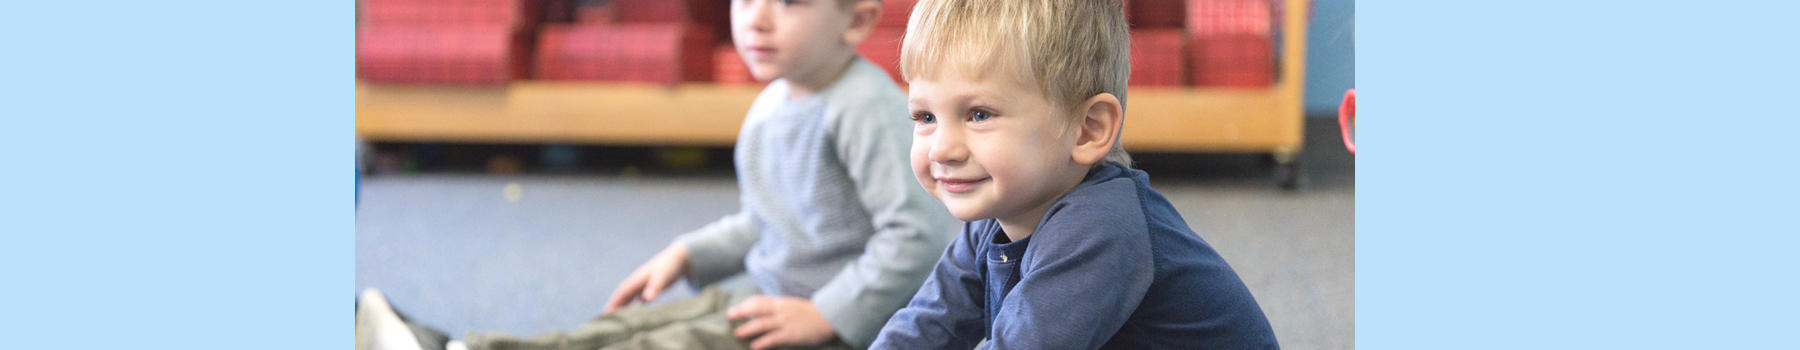 preschool-home-slider-oct2018-6